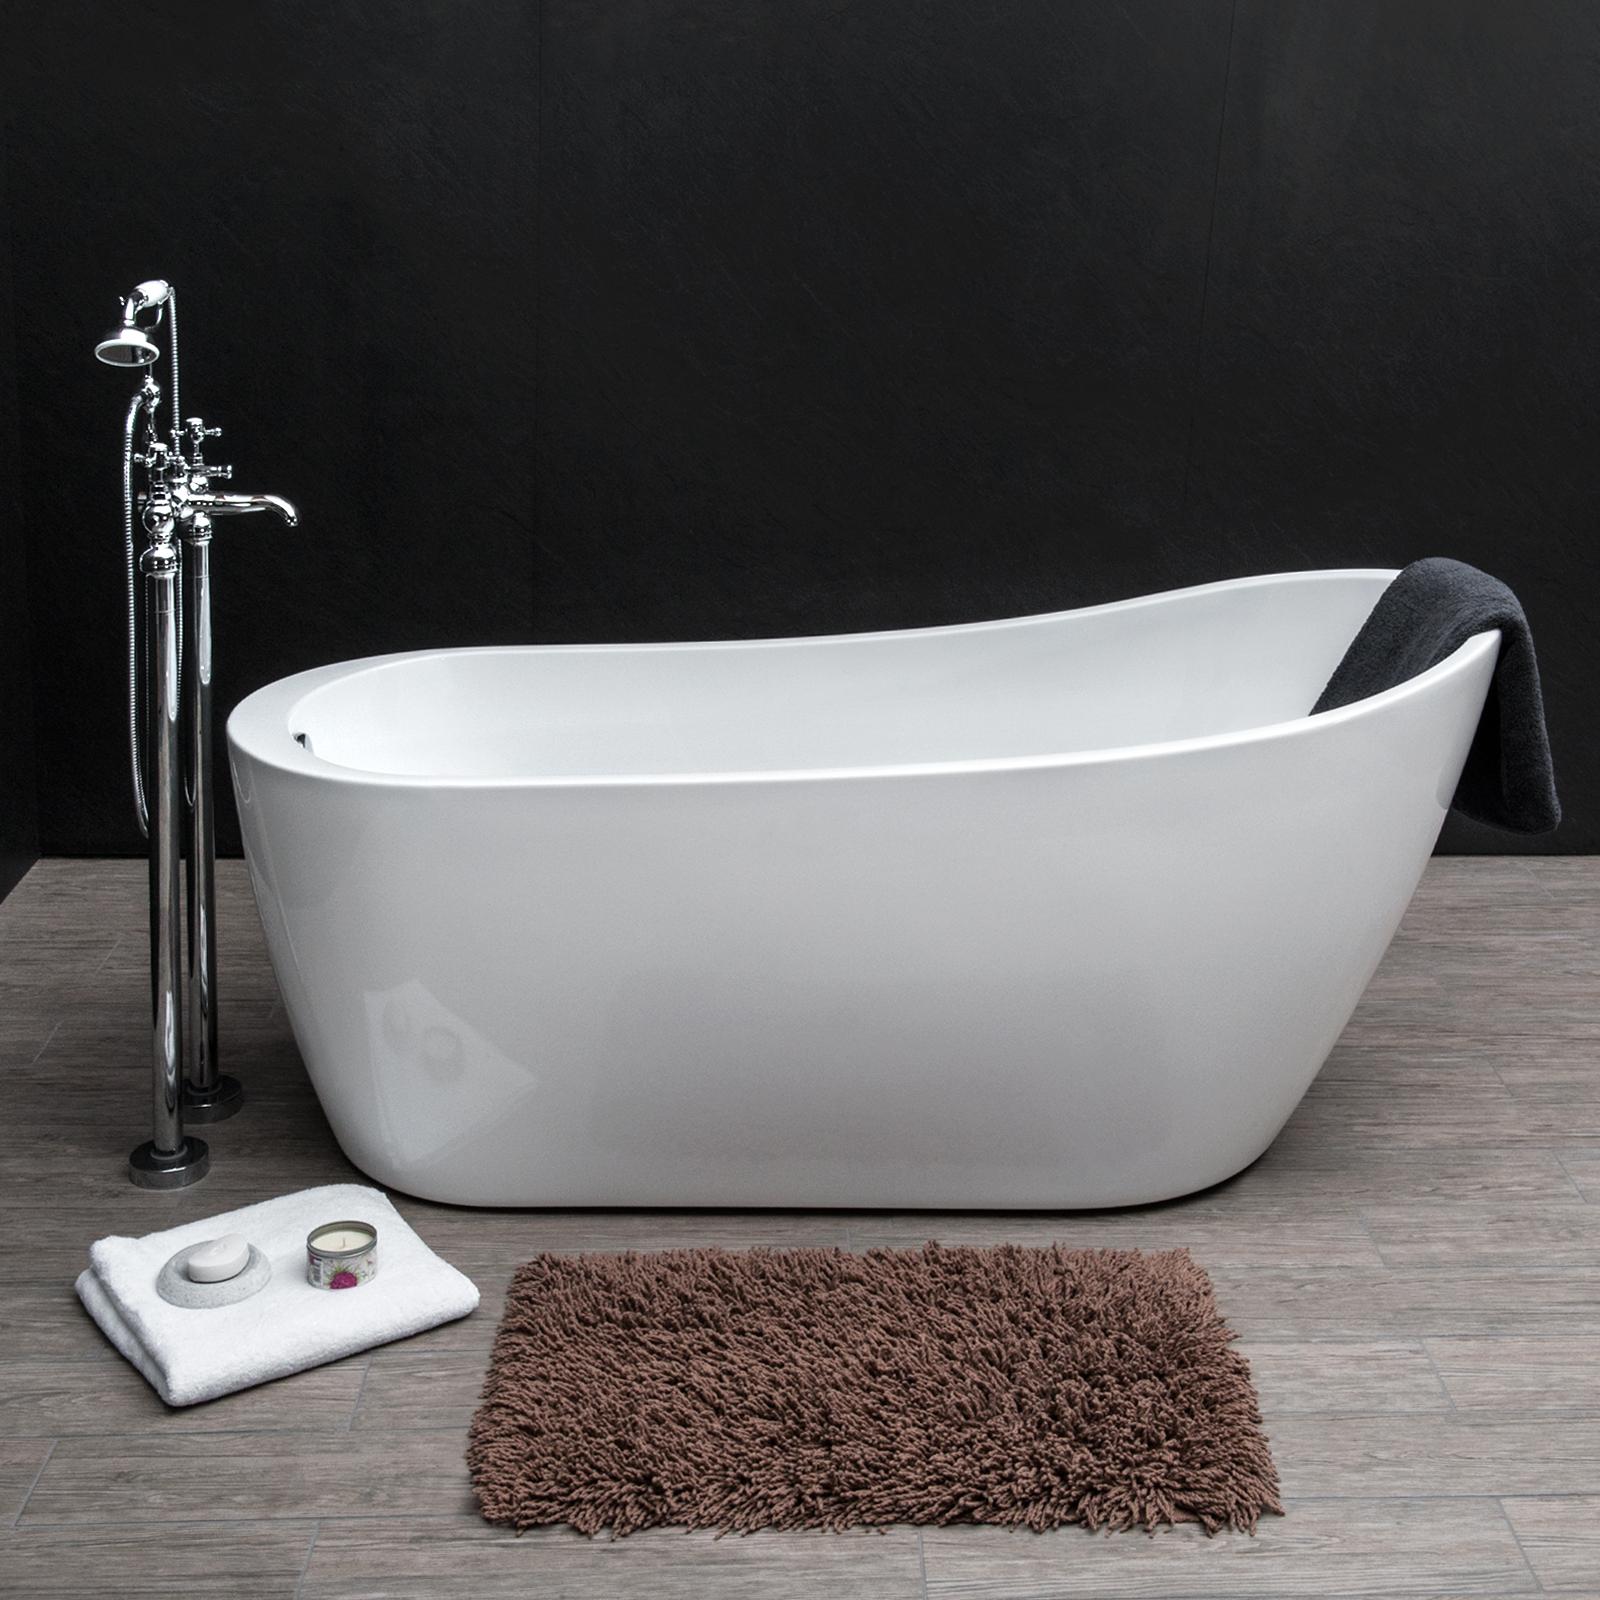 Savisto Modern Bathroom Luxury Trento Contemporary Freestanding Slipper Bath